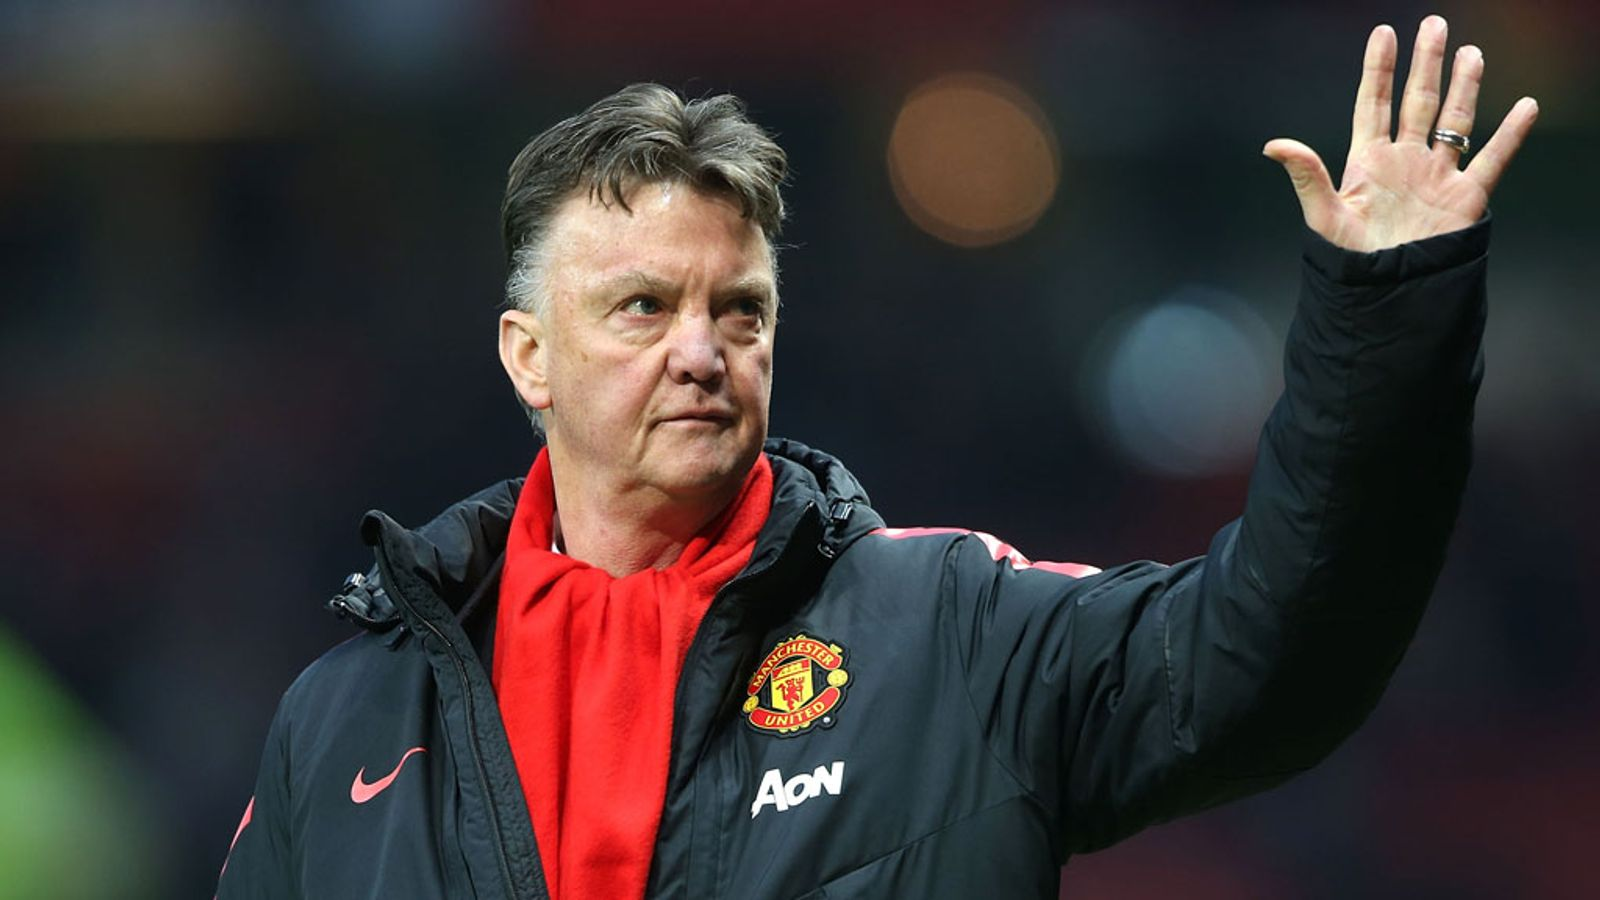 Man Utd Boss Louis Van Gaal Says 'signing Players Is A